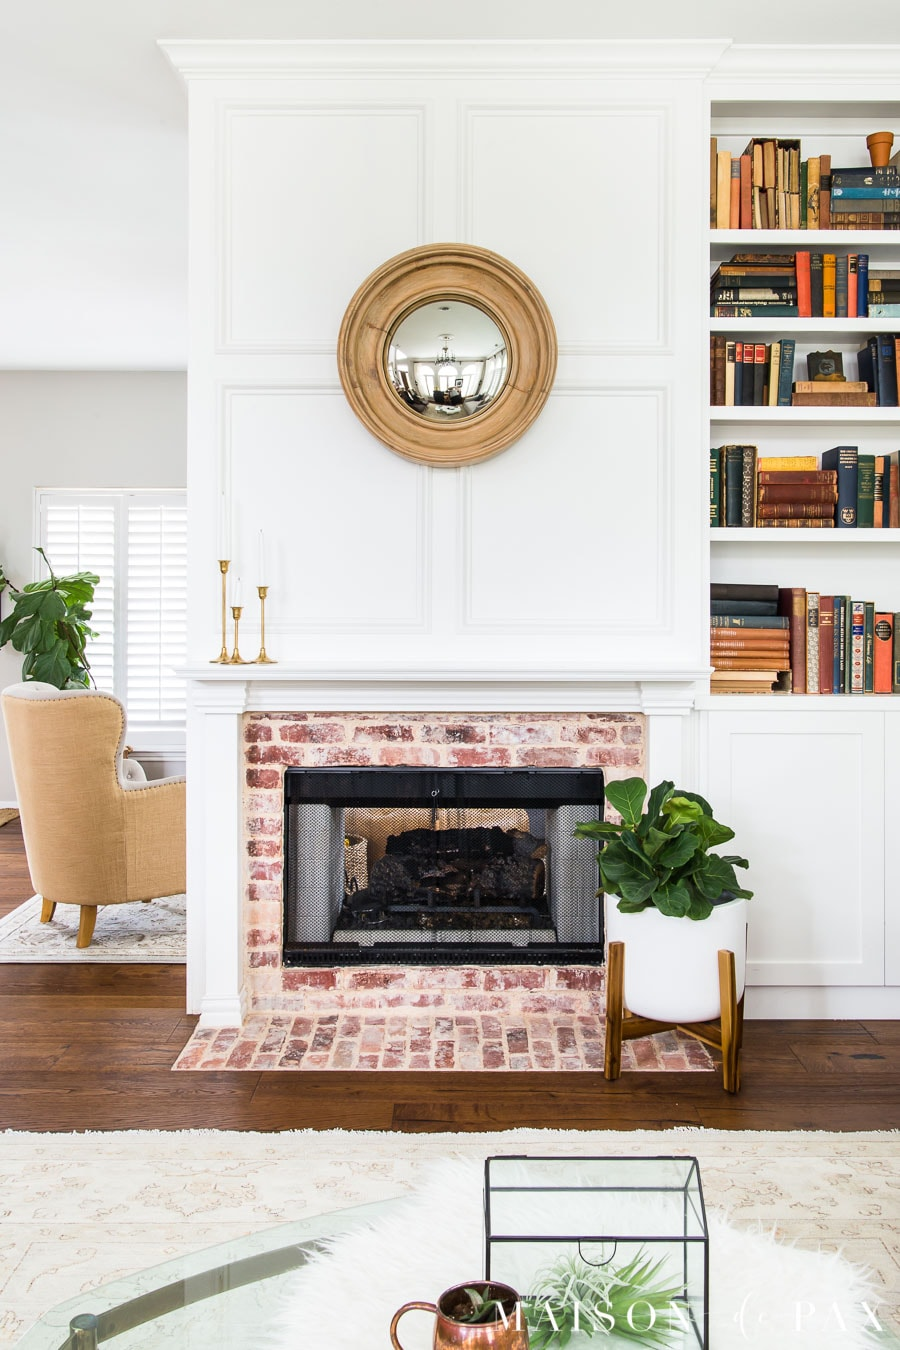 wood wall treatment: decorative molding around fireplace